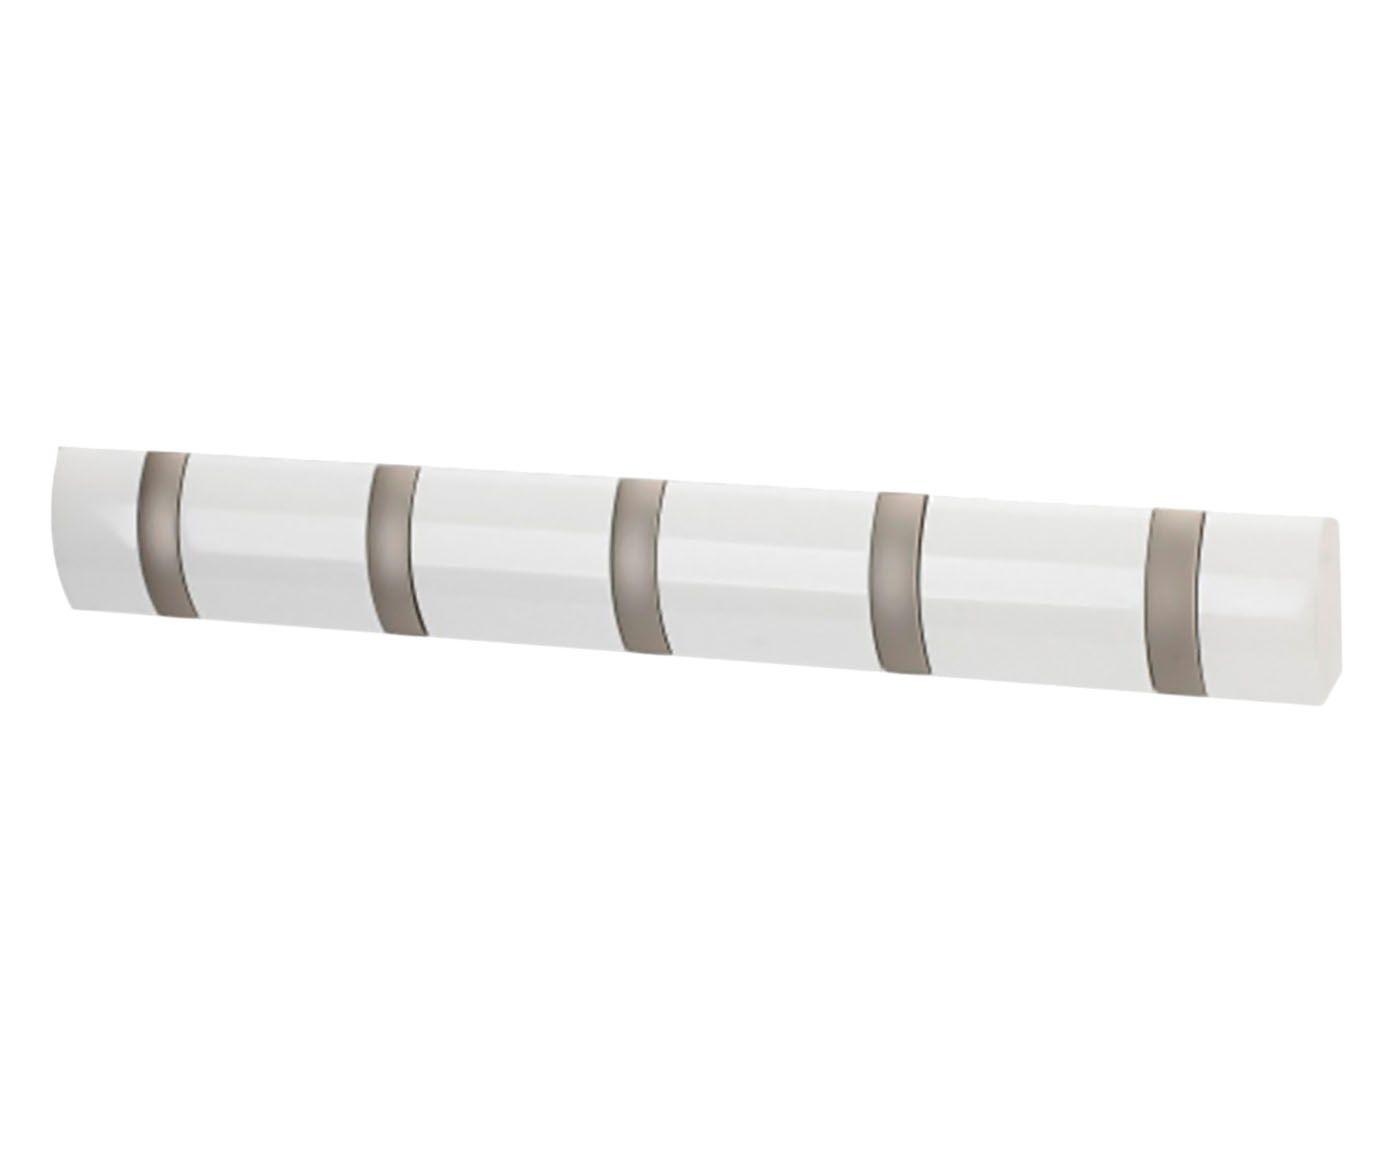 Cabideiro Flip Branco - 51cm | Westwing.com.br